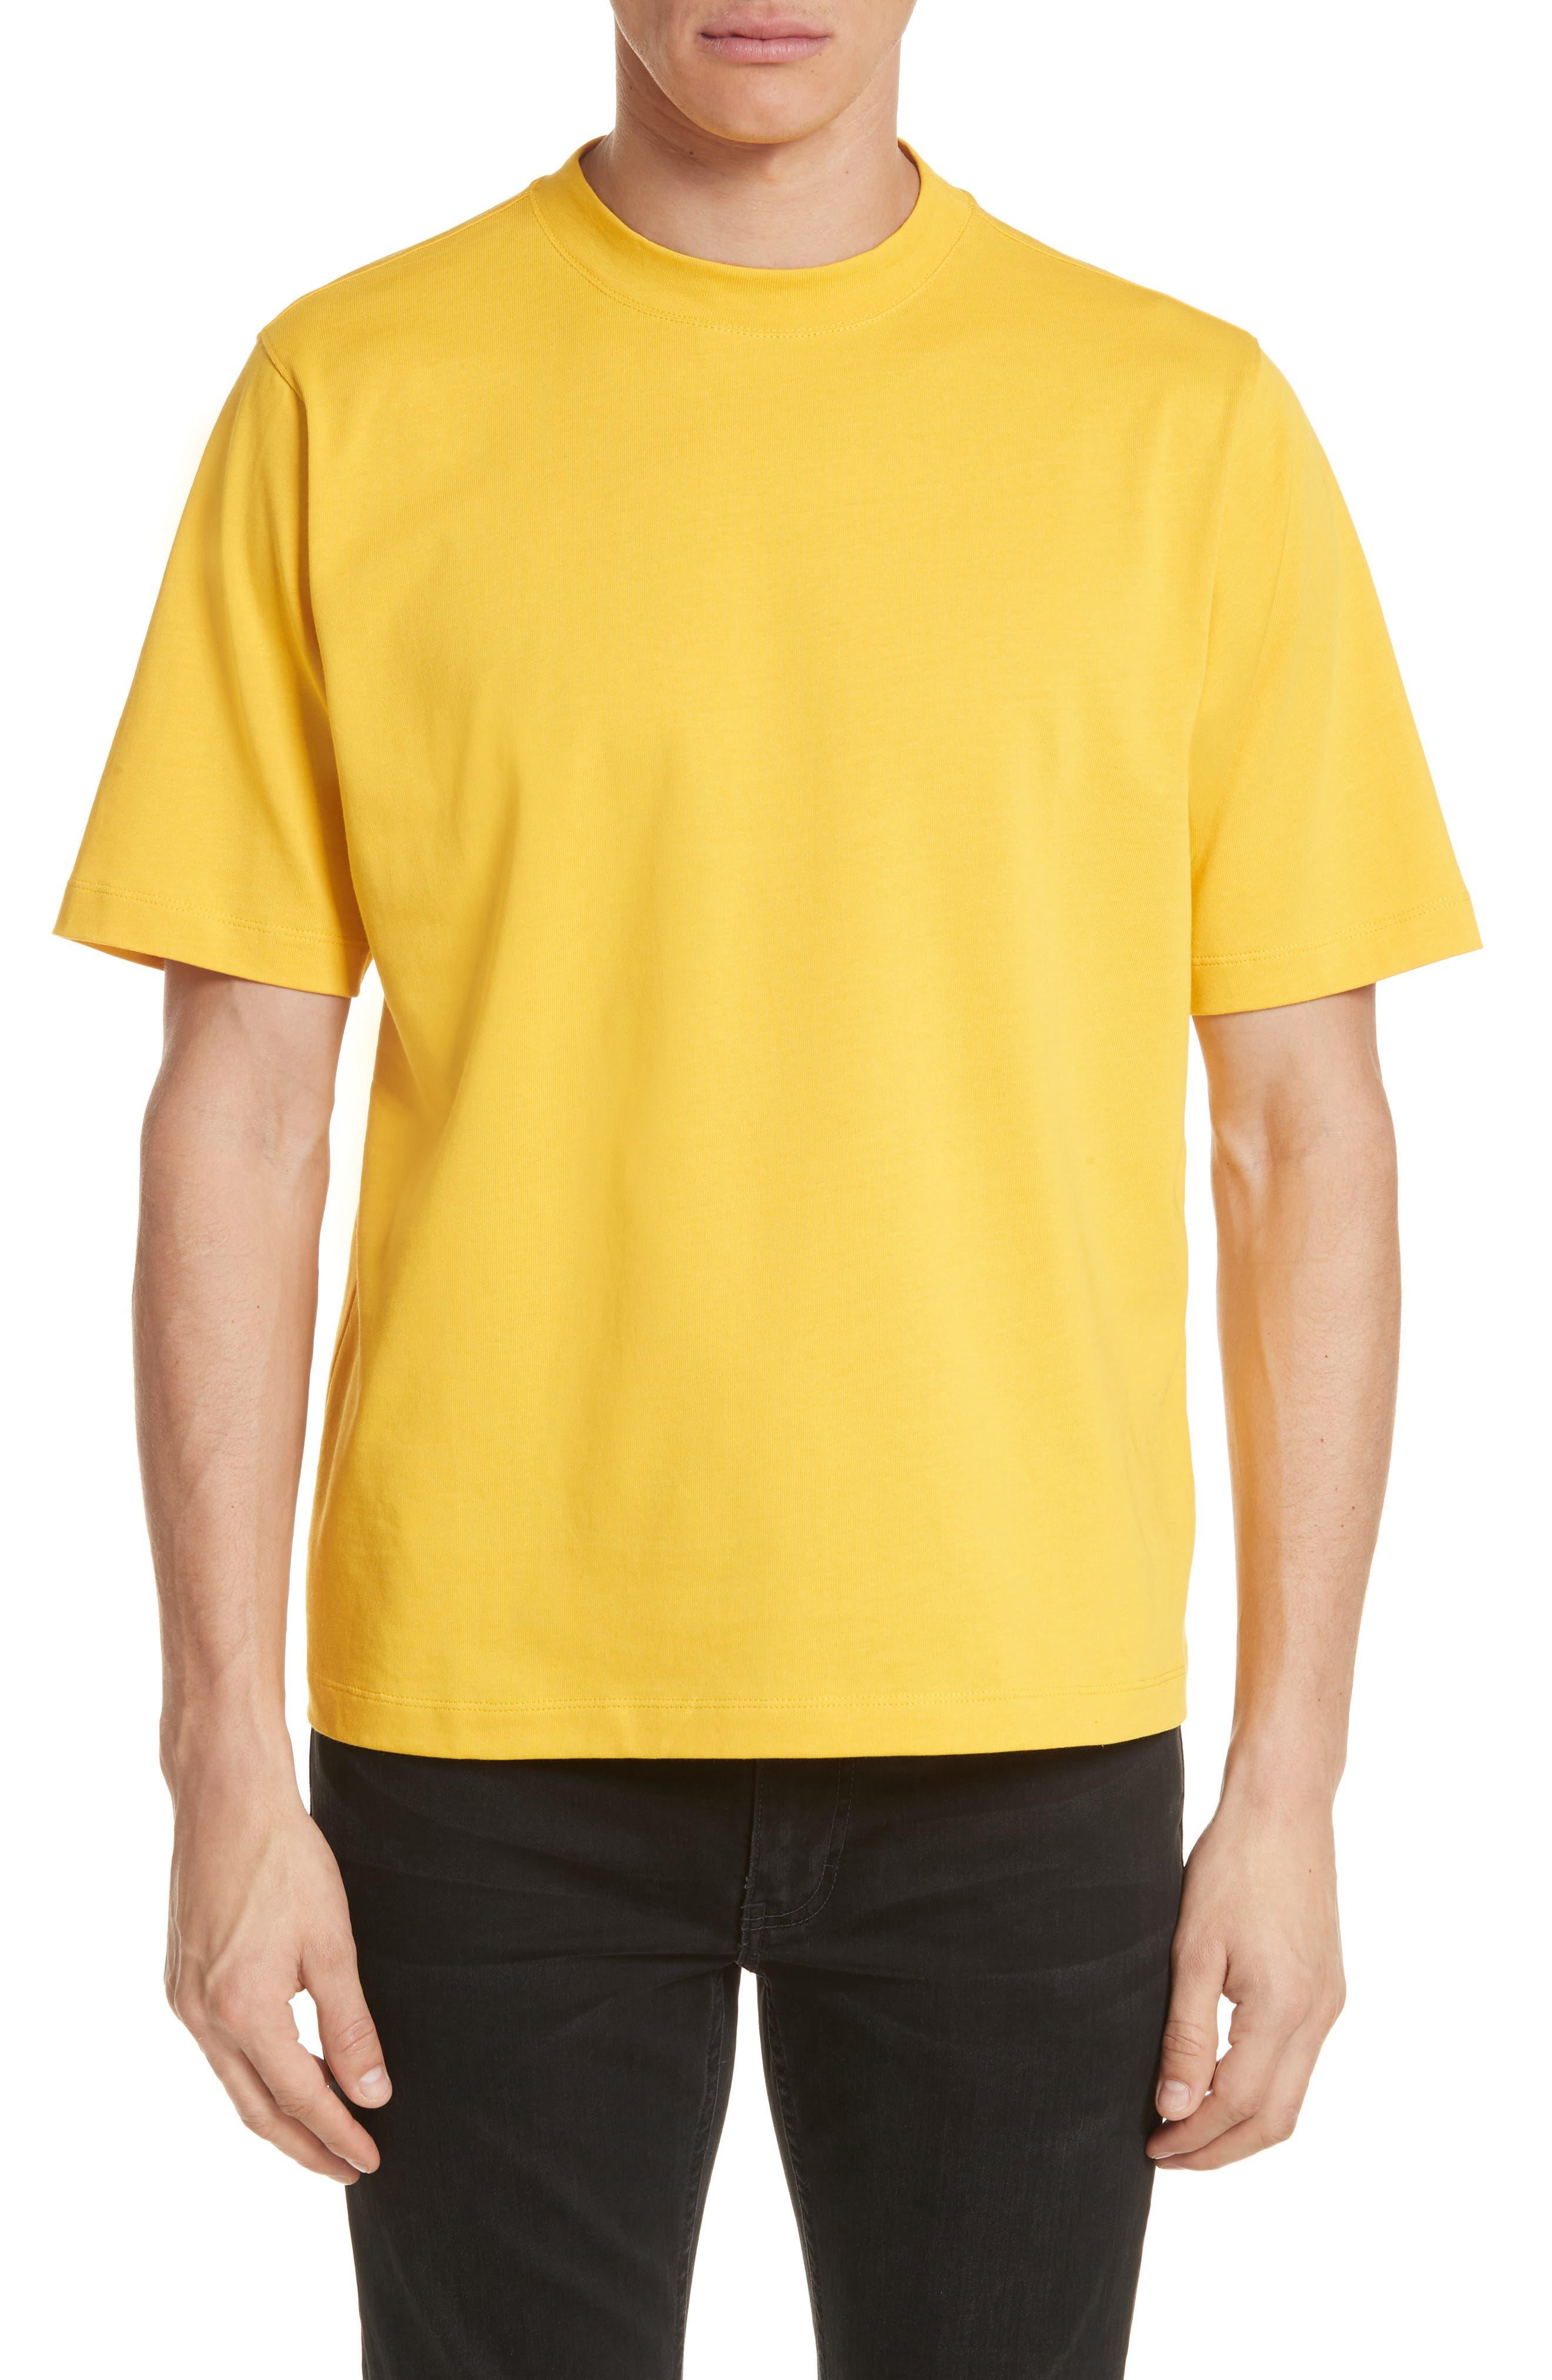 Main Image - Helmut Lang Tall T-Shirt